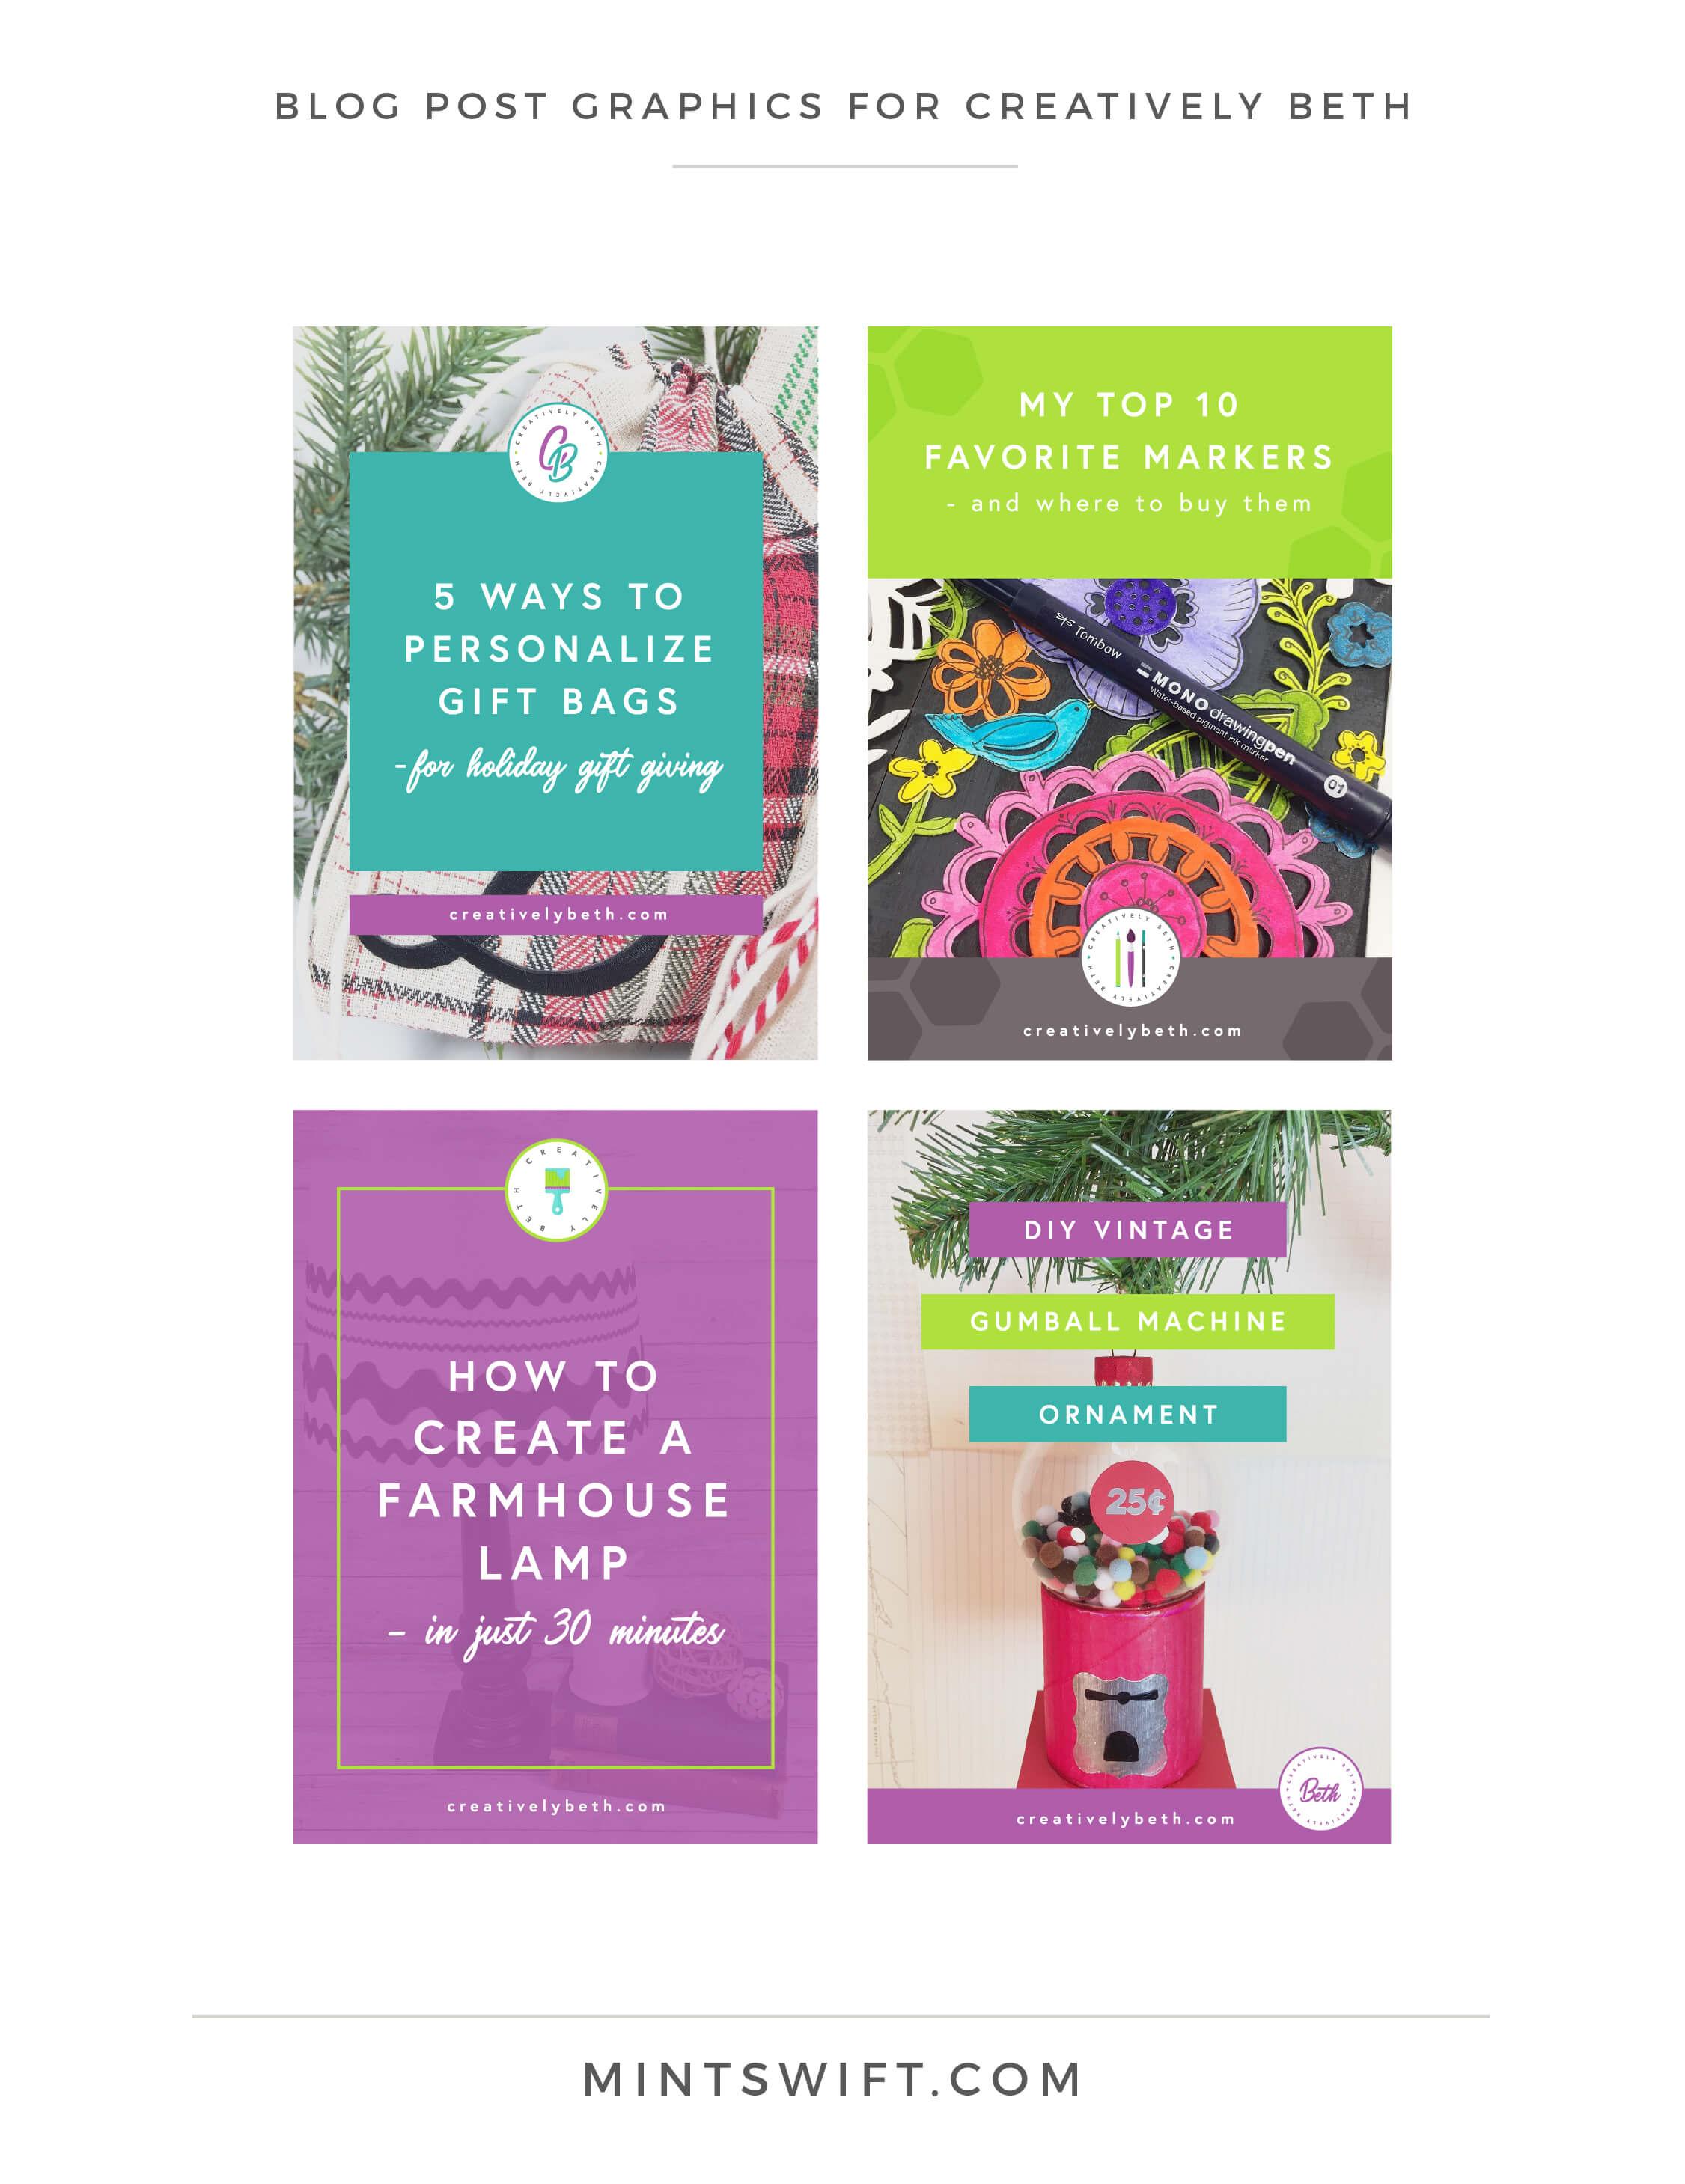 Creatively Beth - Blog post graphics - Brand & Website Design - MintSwift